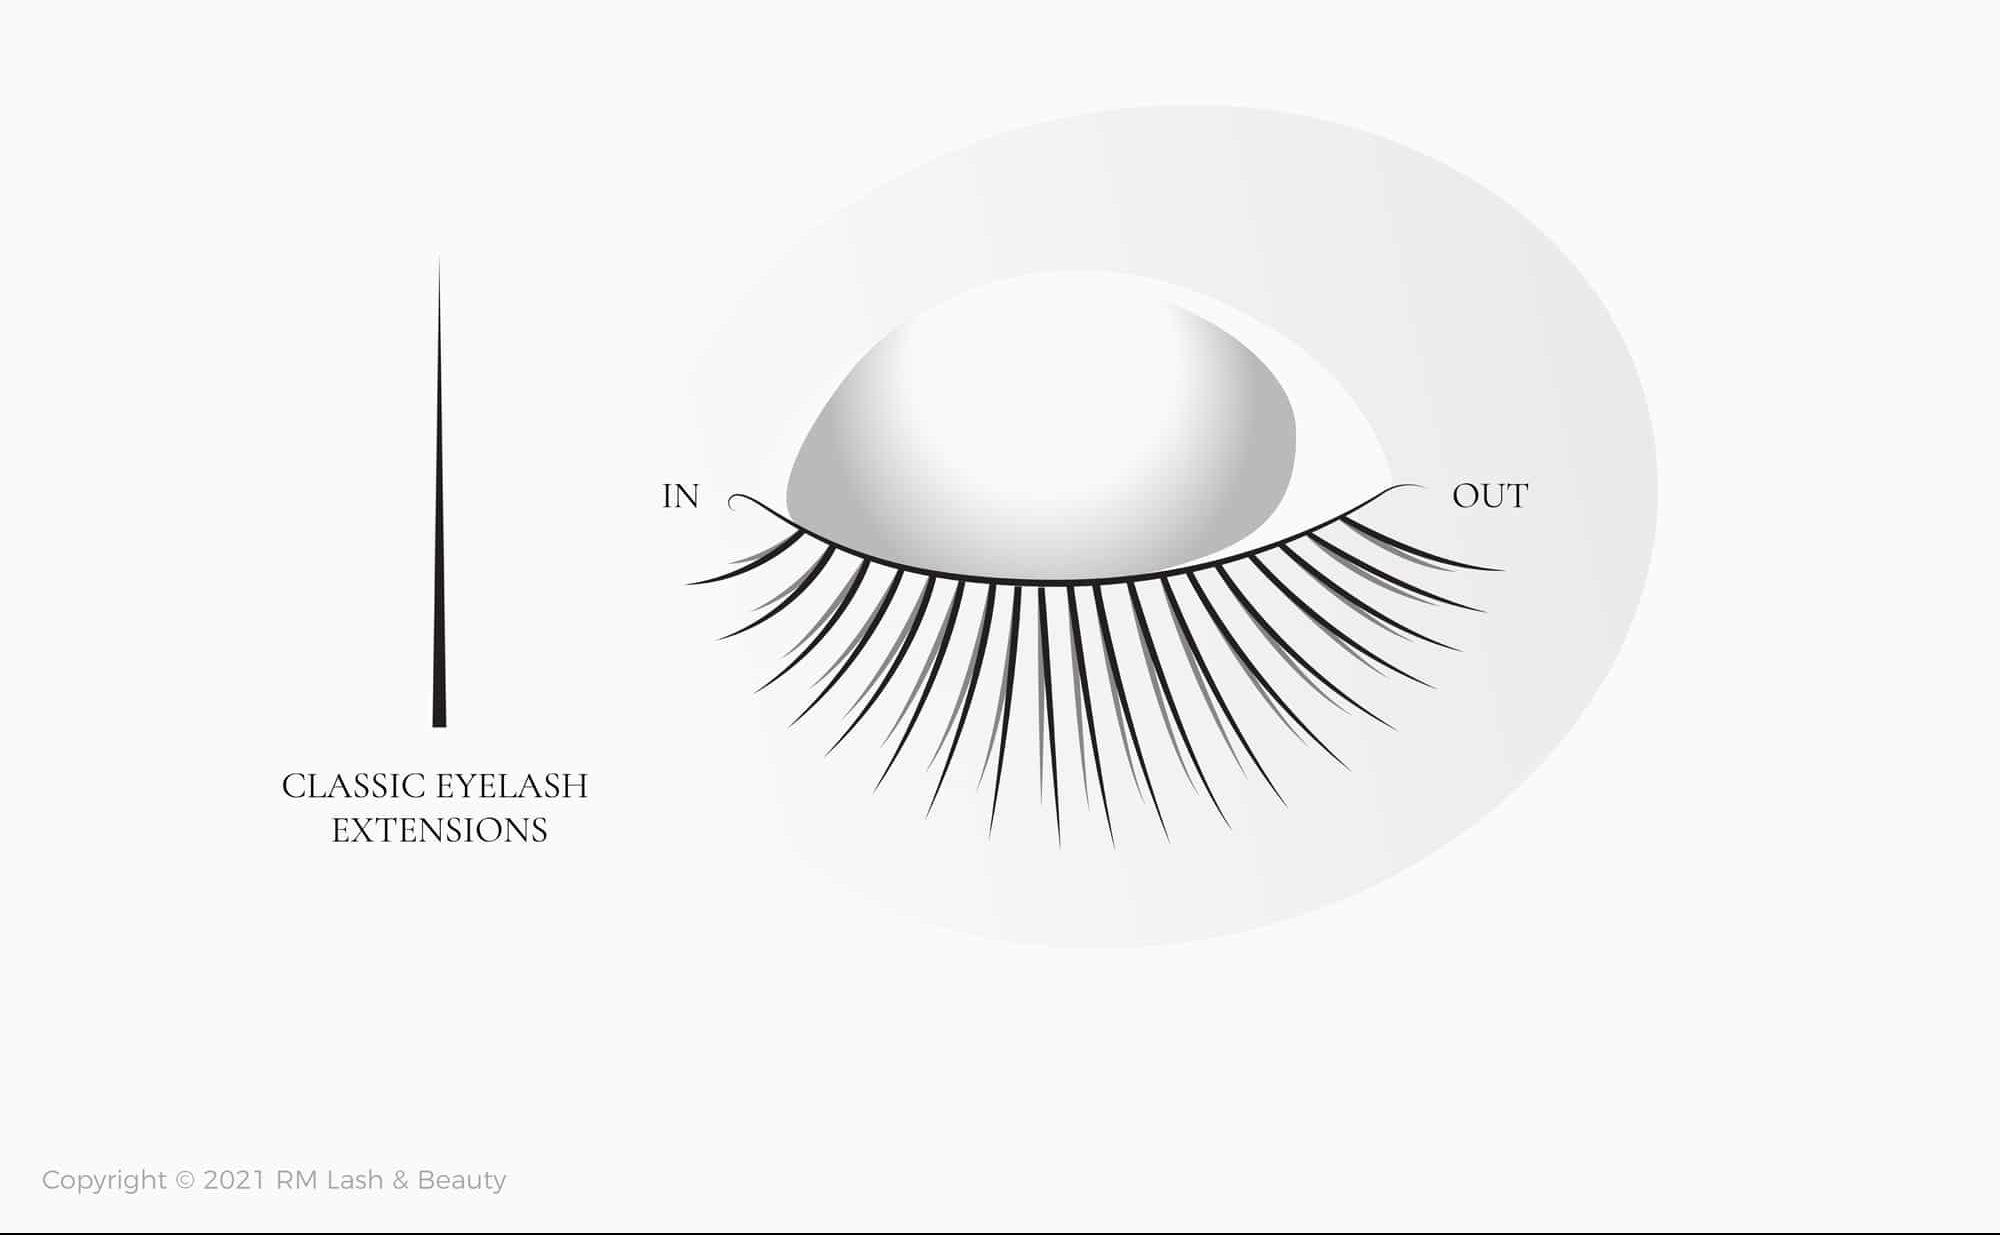 Classic lash extensions illustration example.